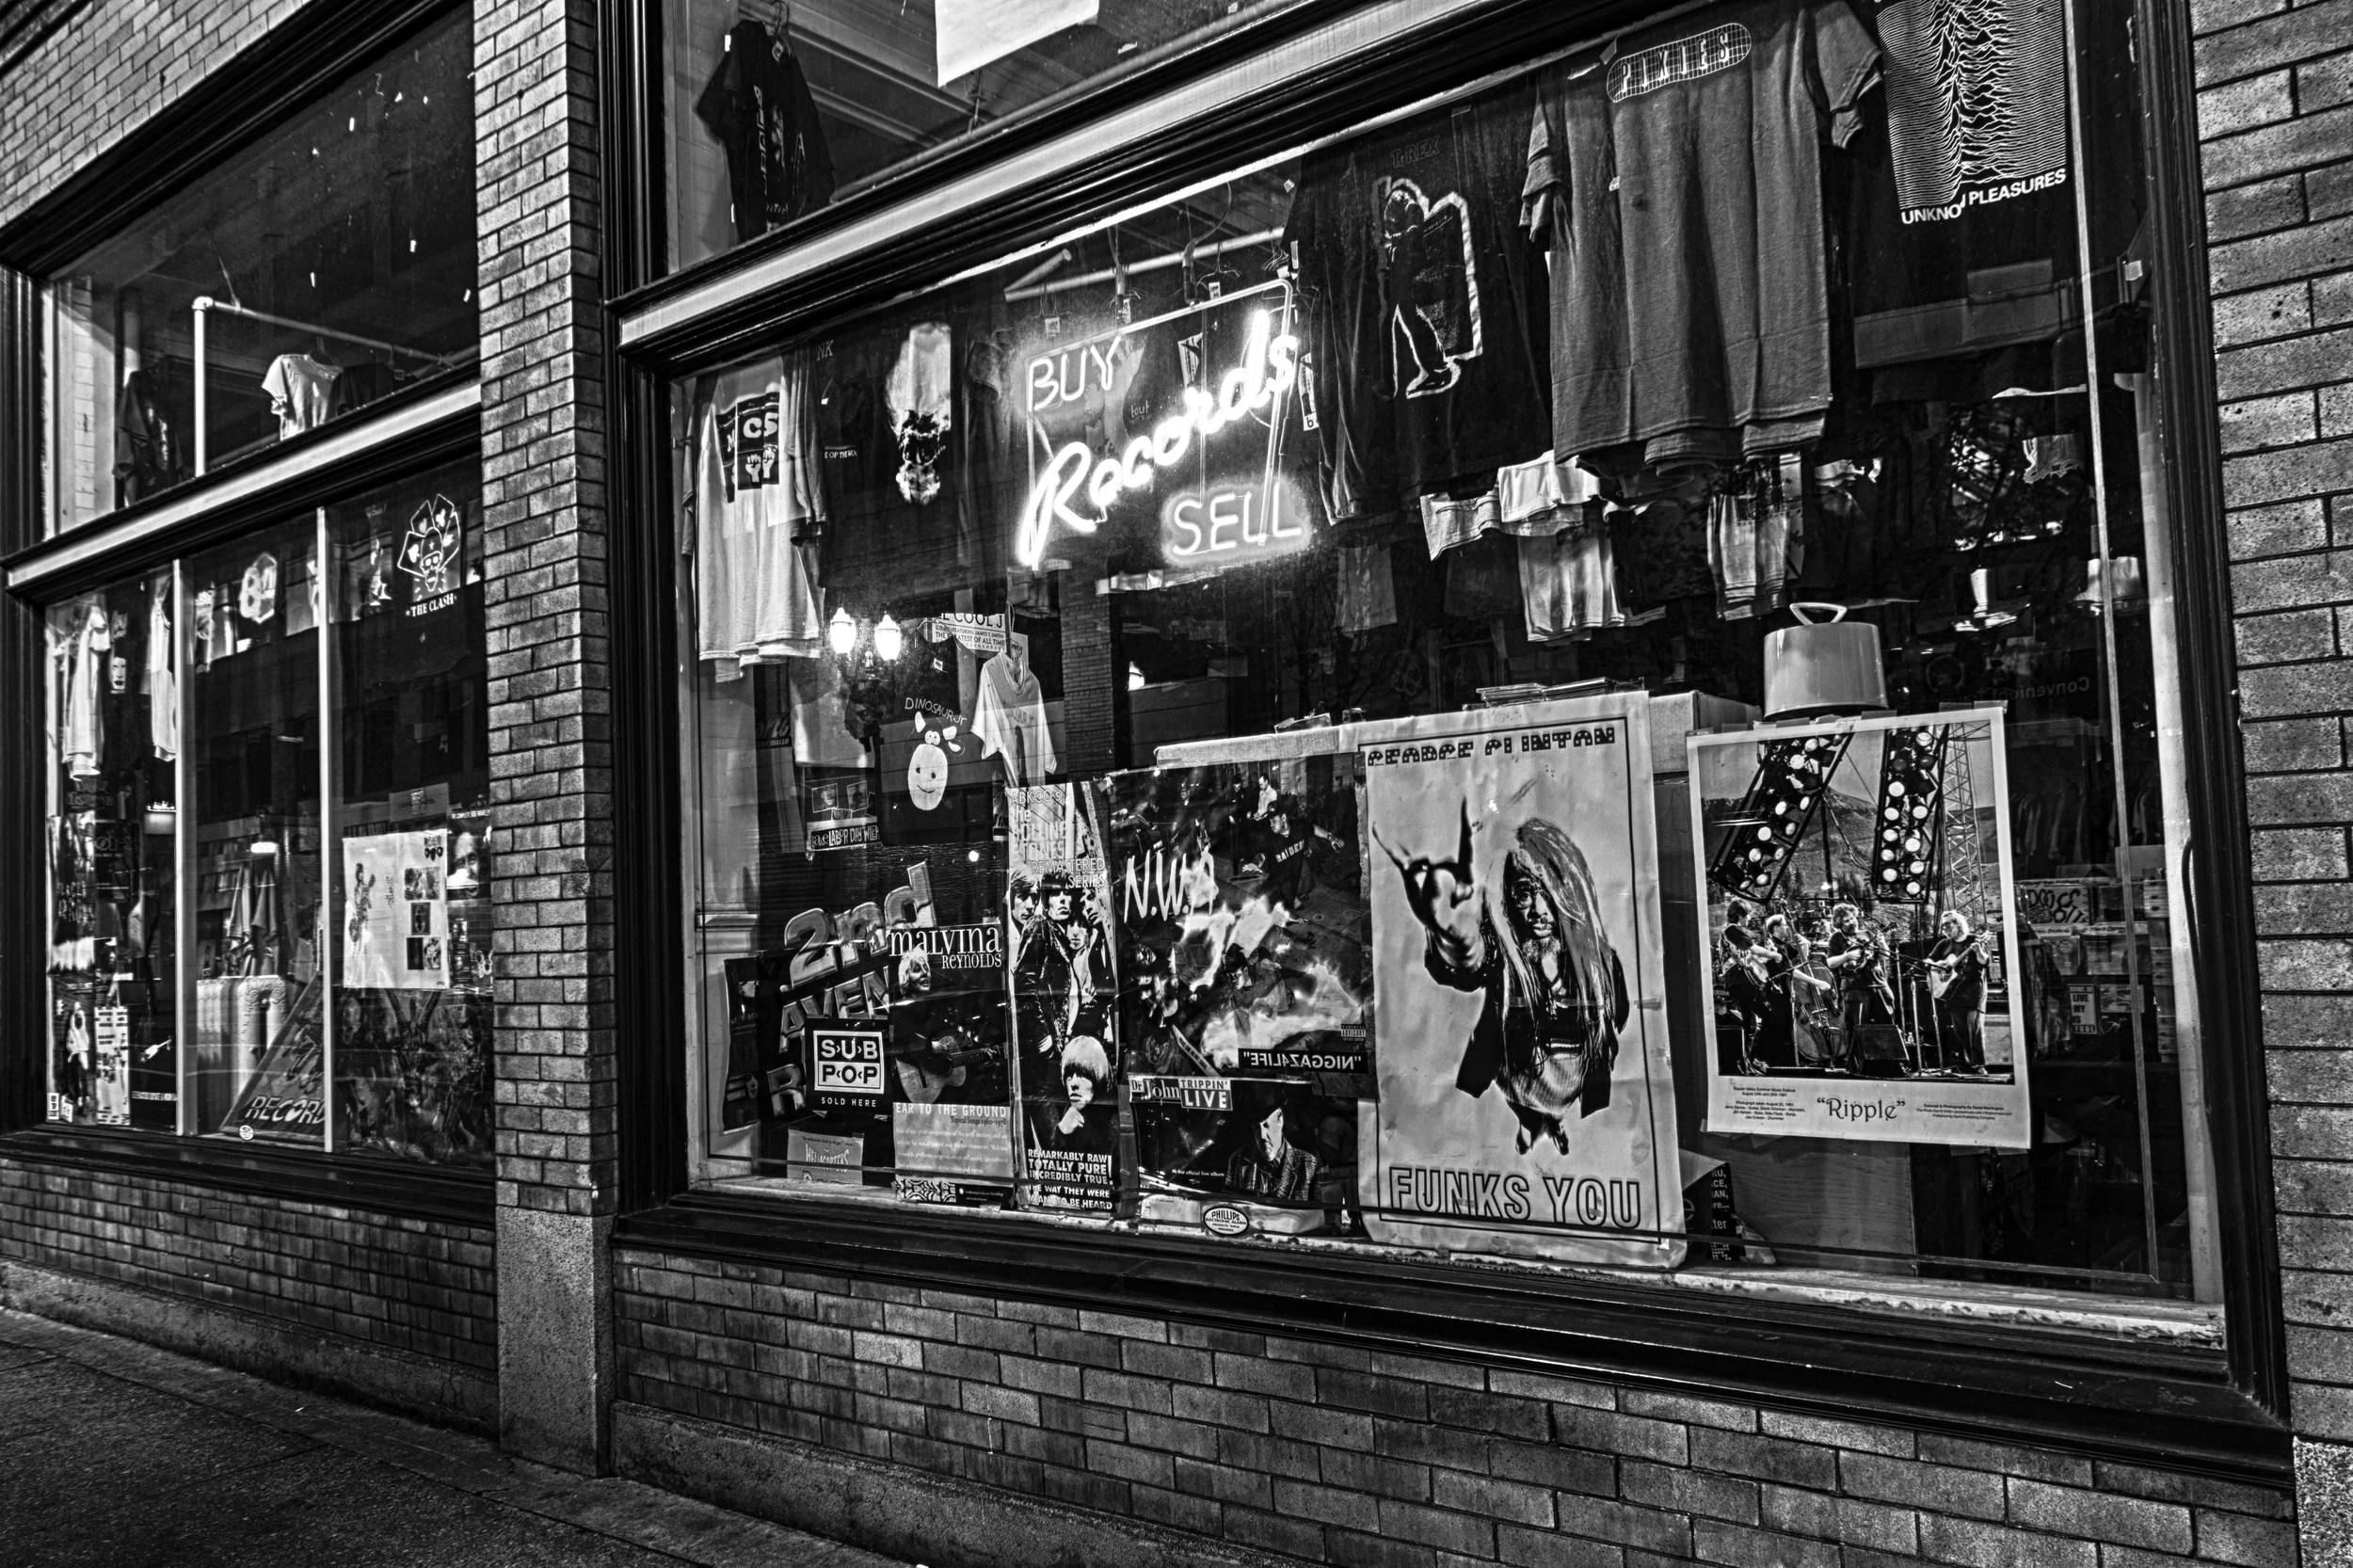 PortlandOregon_20141109_335_HDR.jpg